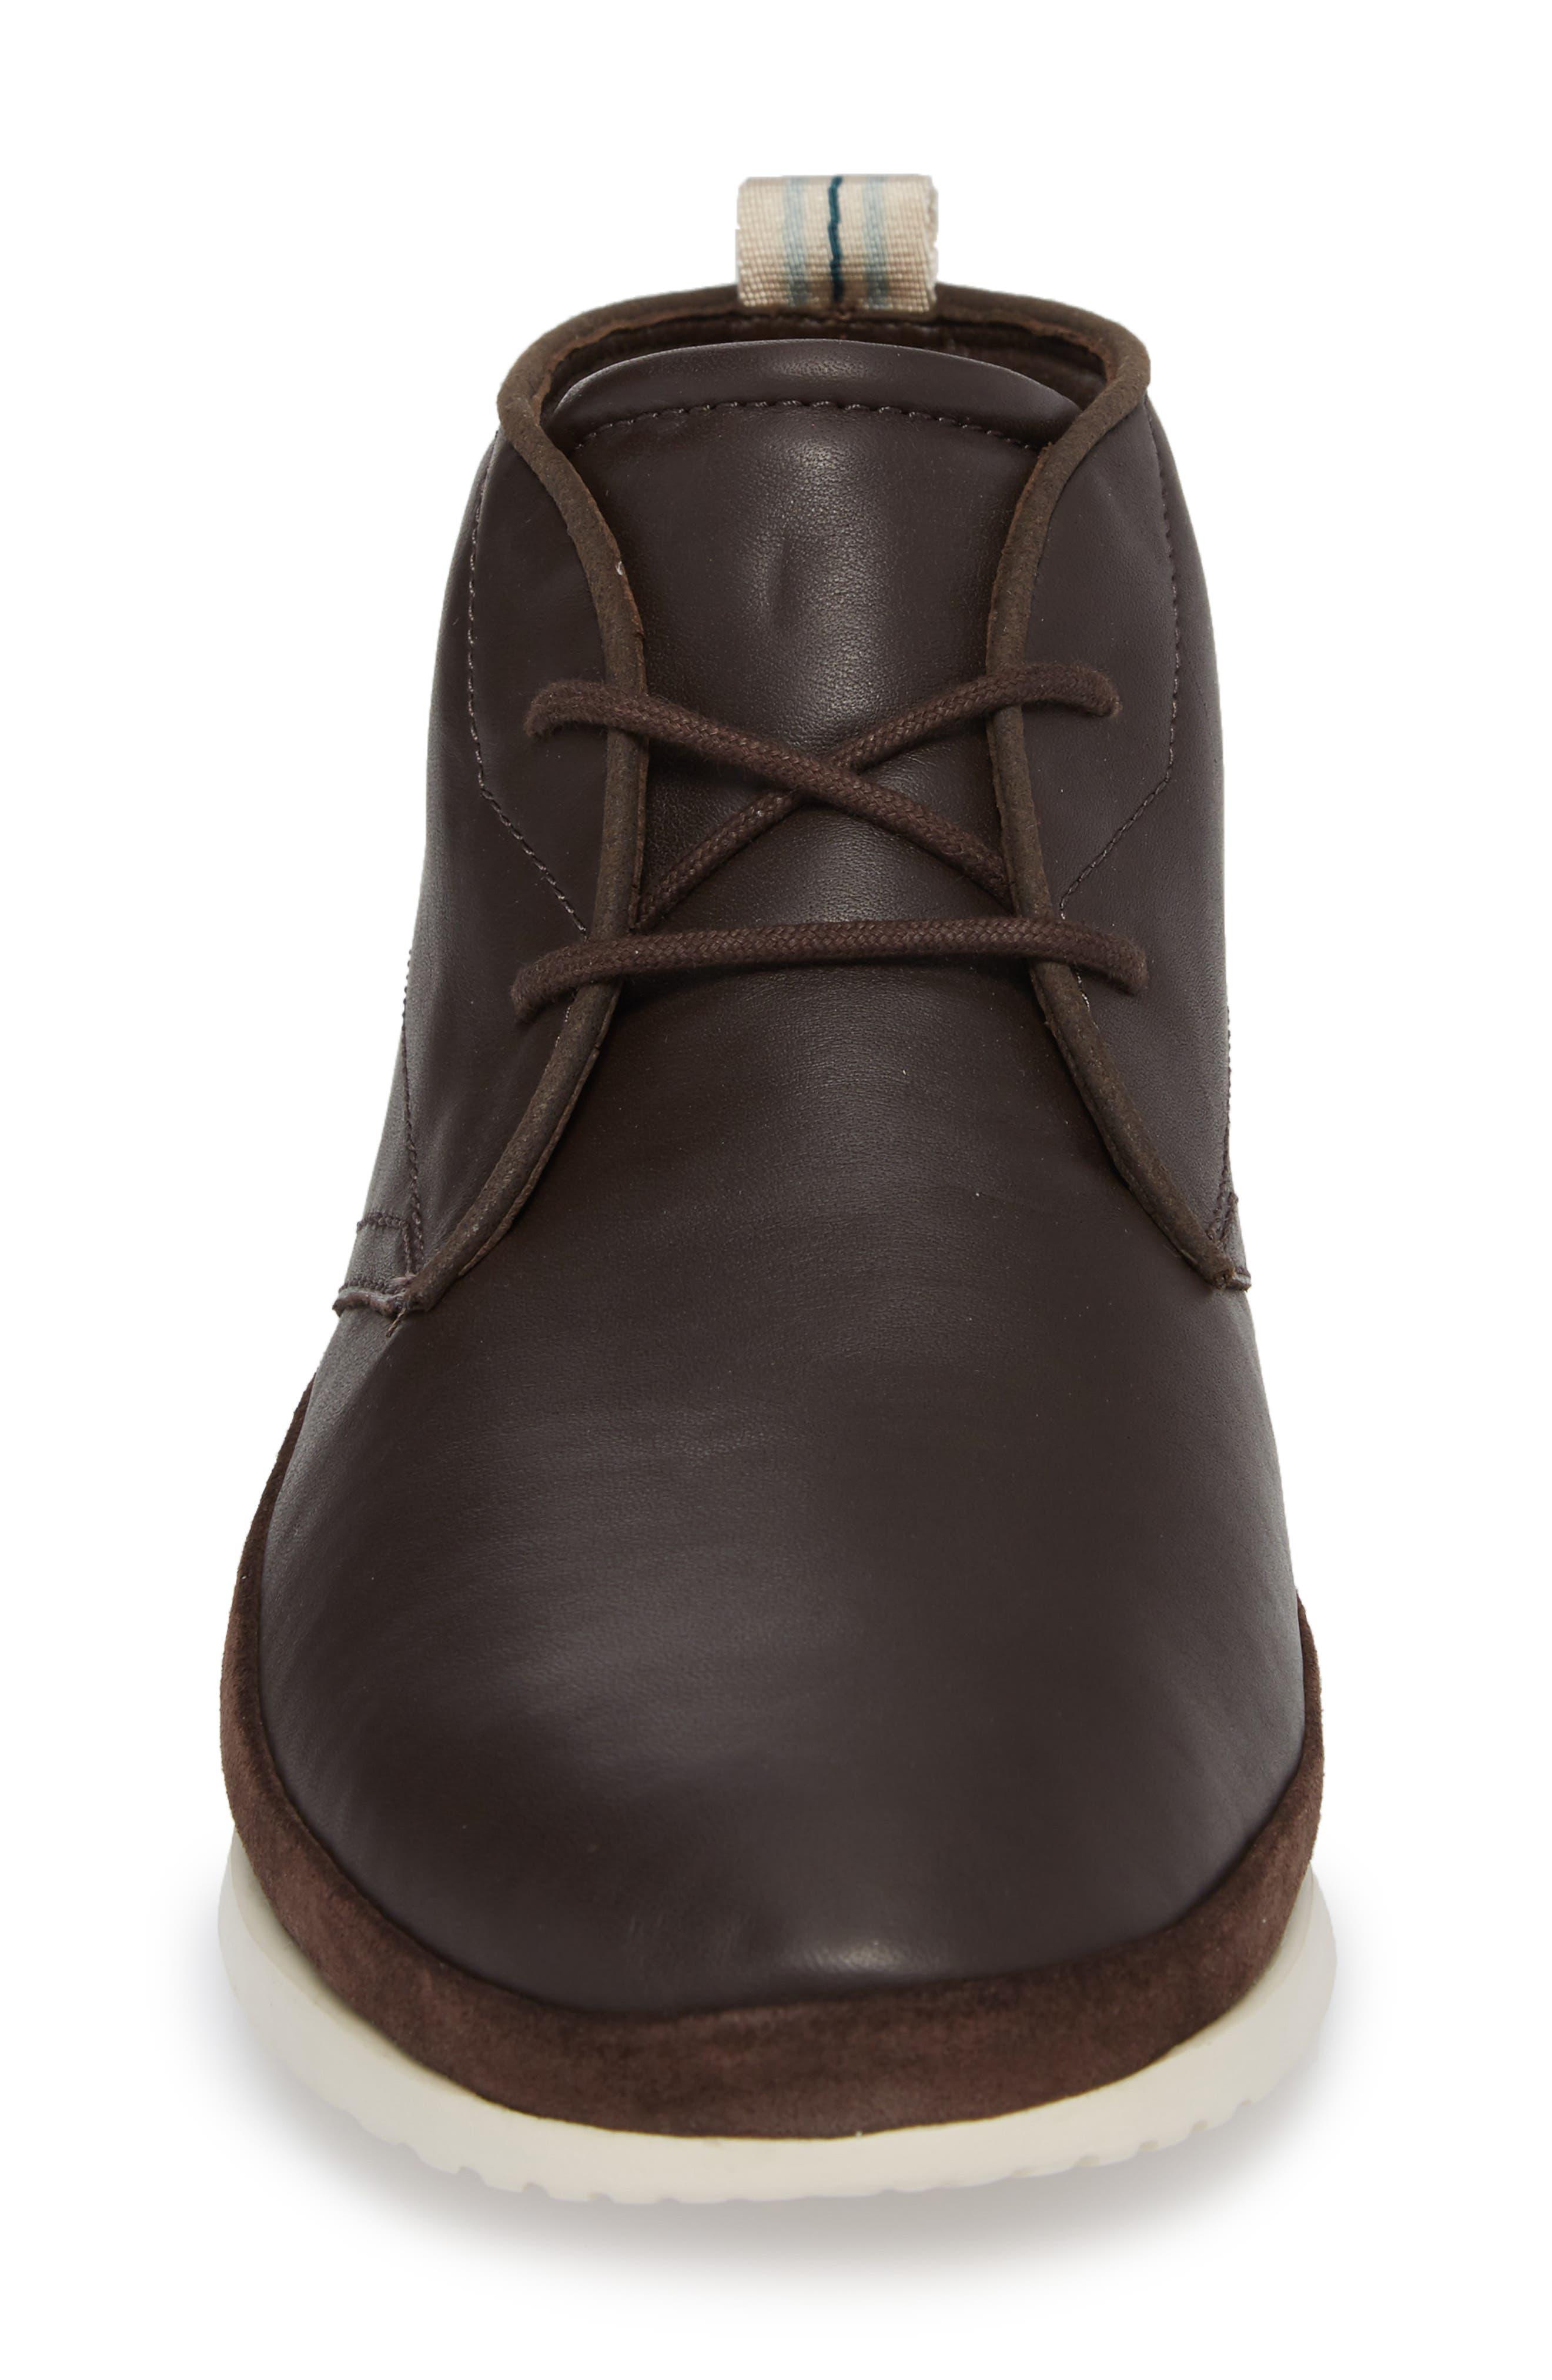 Cali Chukka Boot,                             Alternate thumbnail 4, color,                             Stout Leather